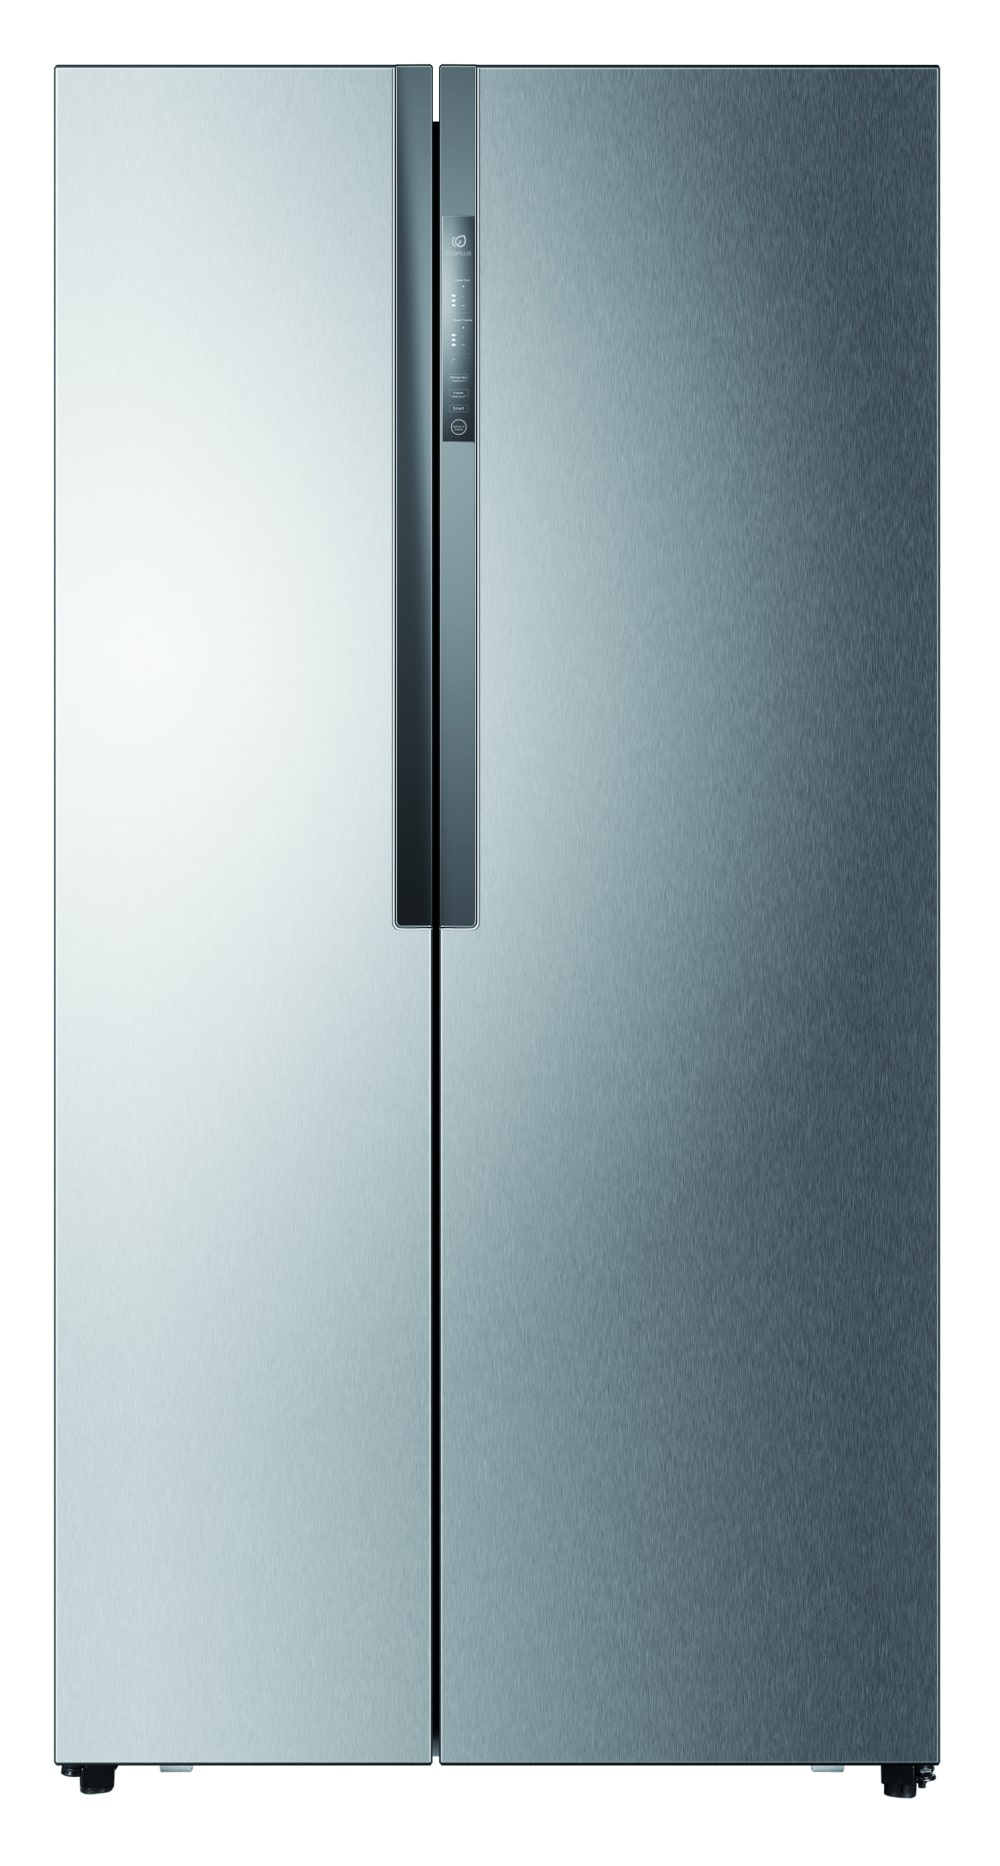 haier 555l stainless steel side by side refrigerator. Black Bedroom Furniture Sets. Home Design Ideas